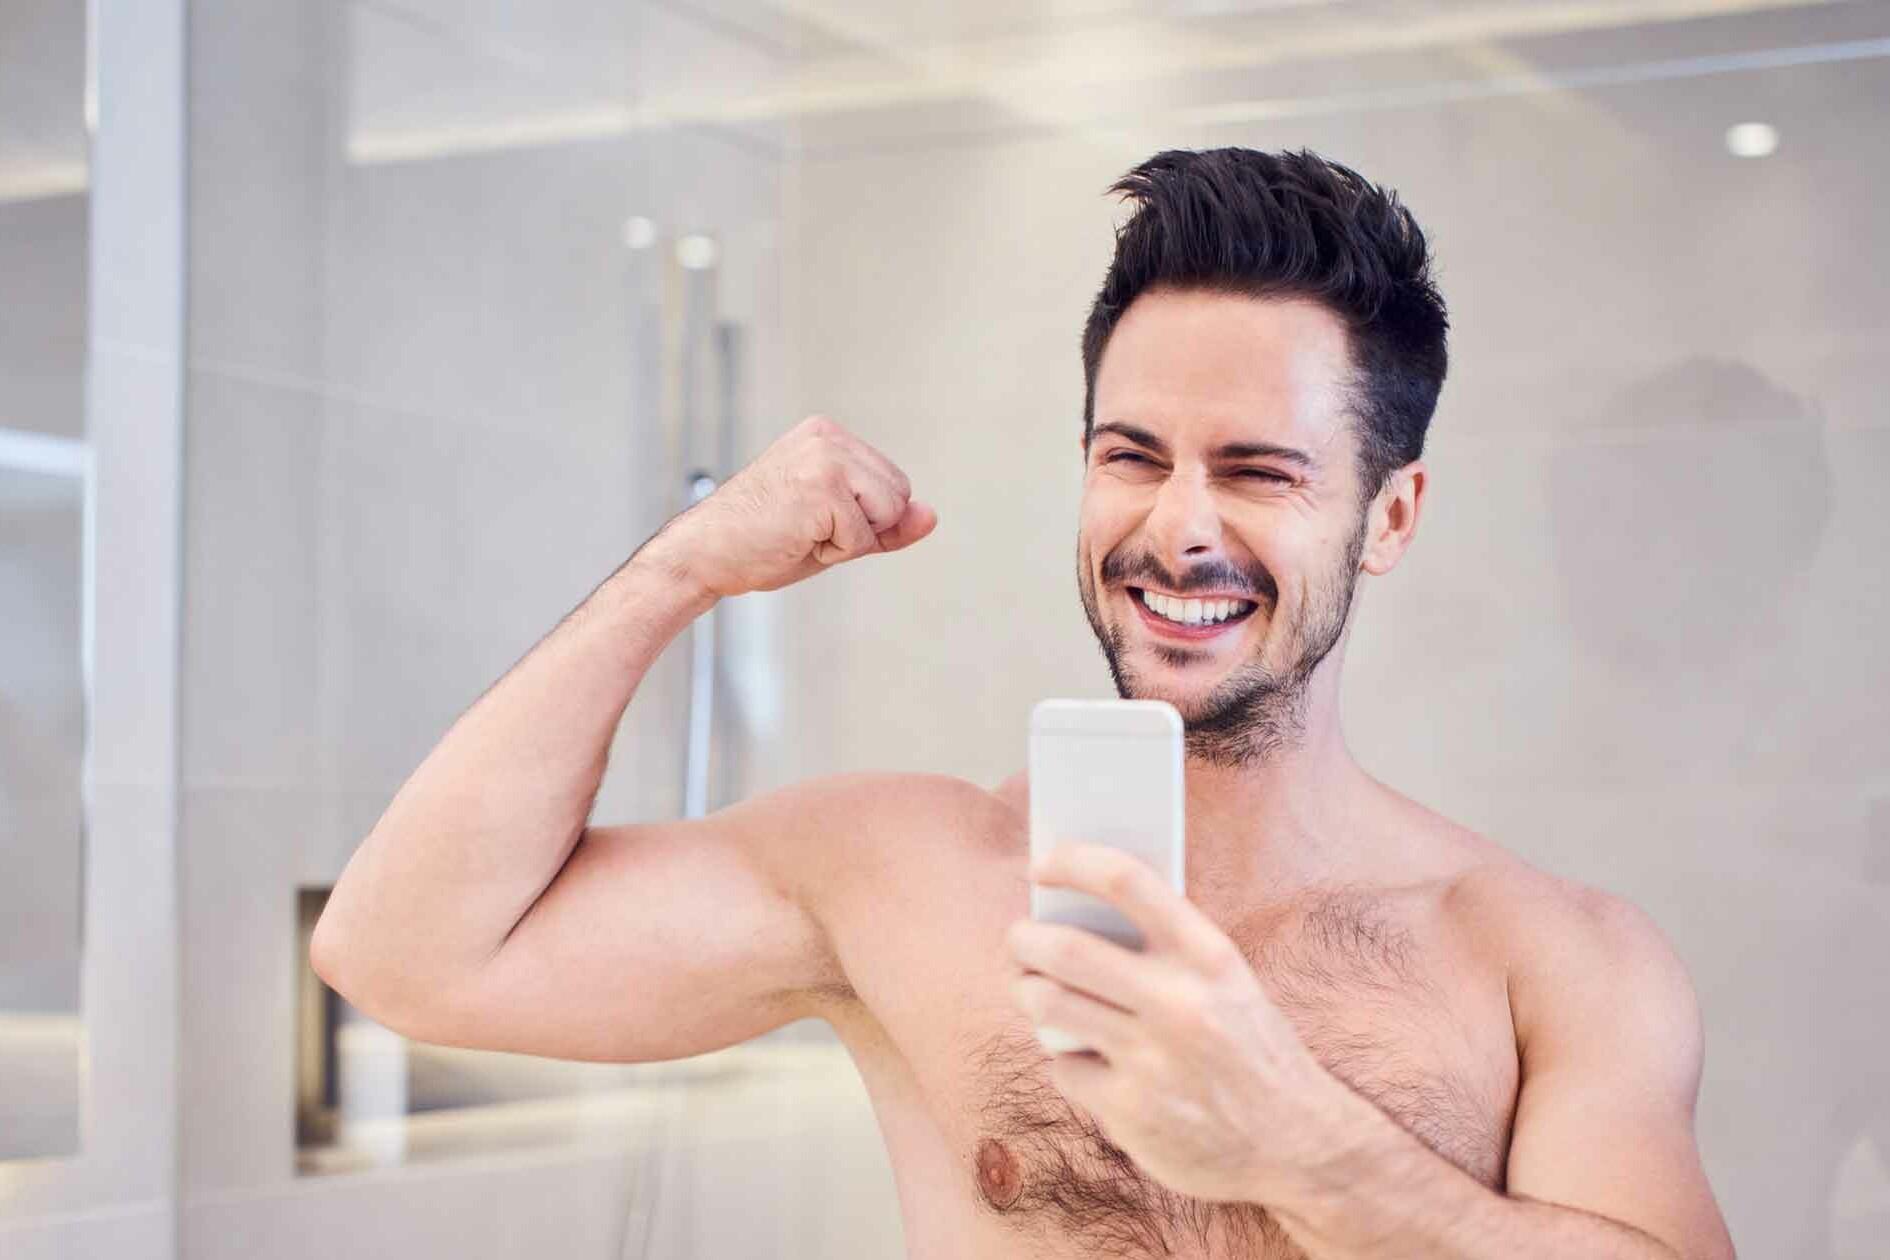 Shirtless Bathroom Selfie - Profile Pics